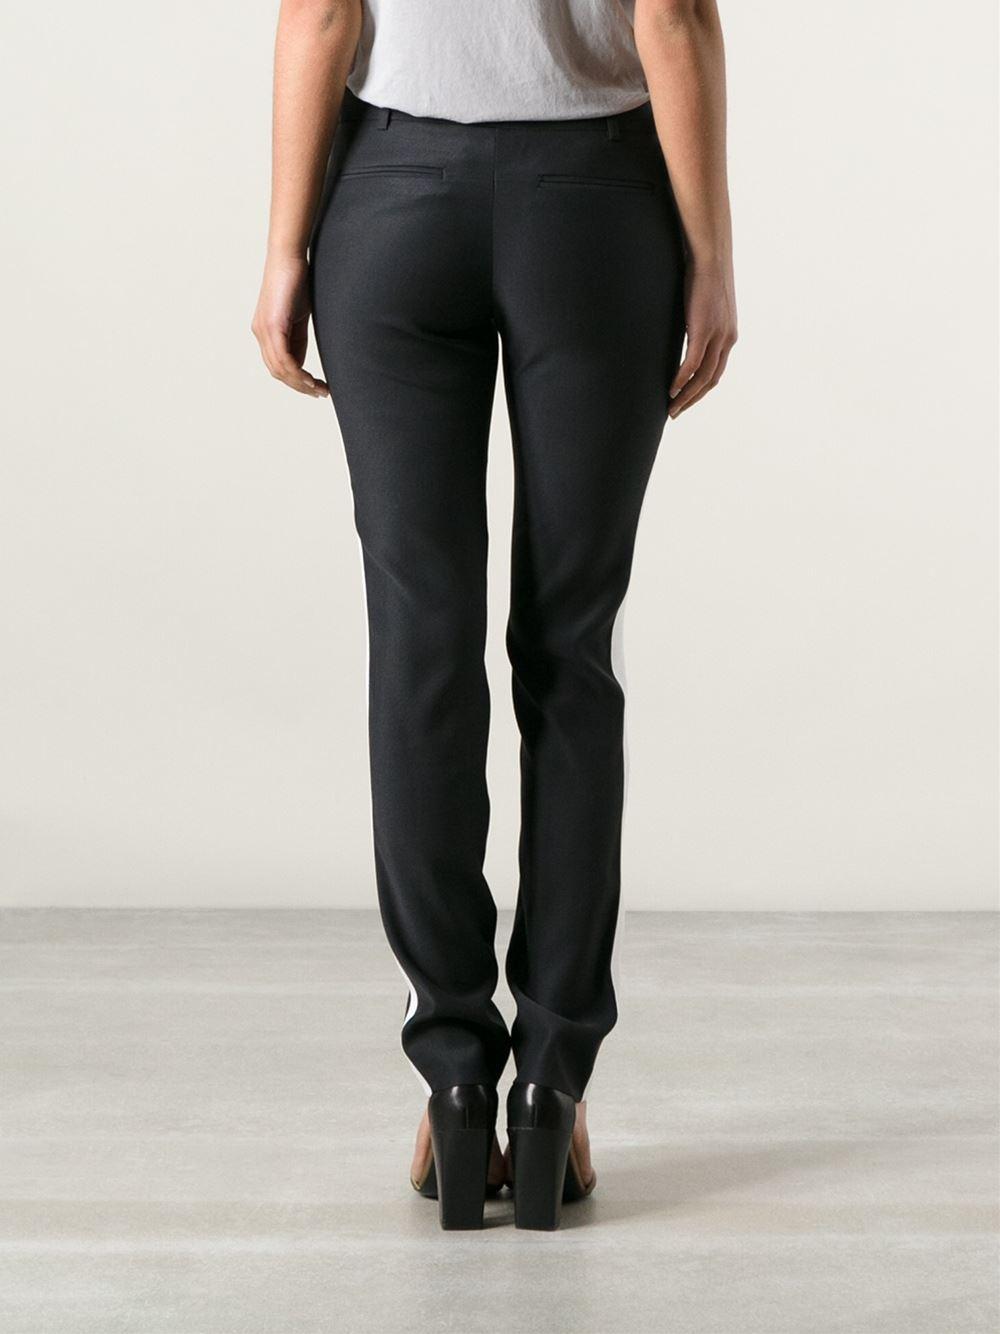 Zadig & Voltaire 'posh' Skinny Trousers - Irina Kha - Farfetch.com